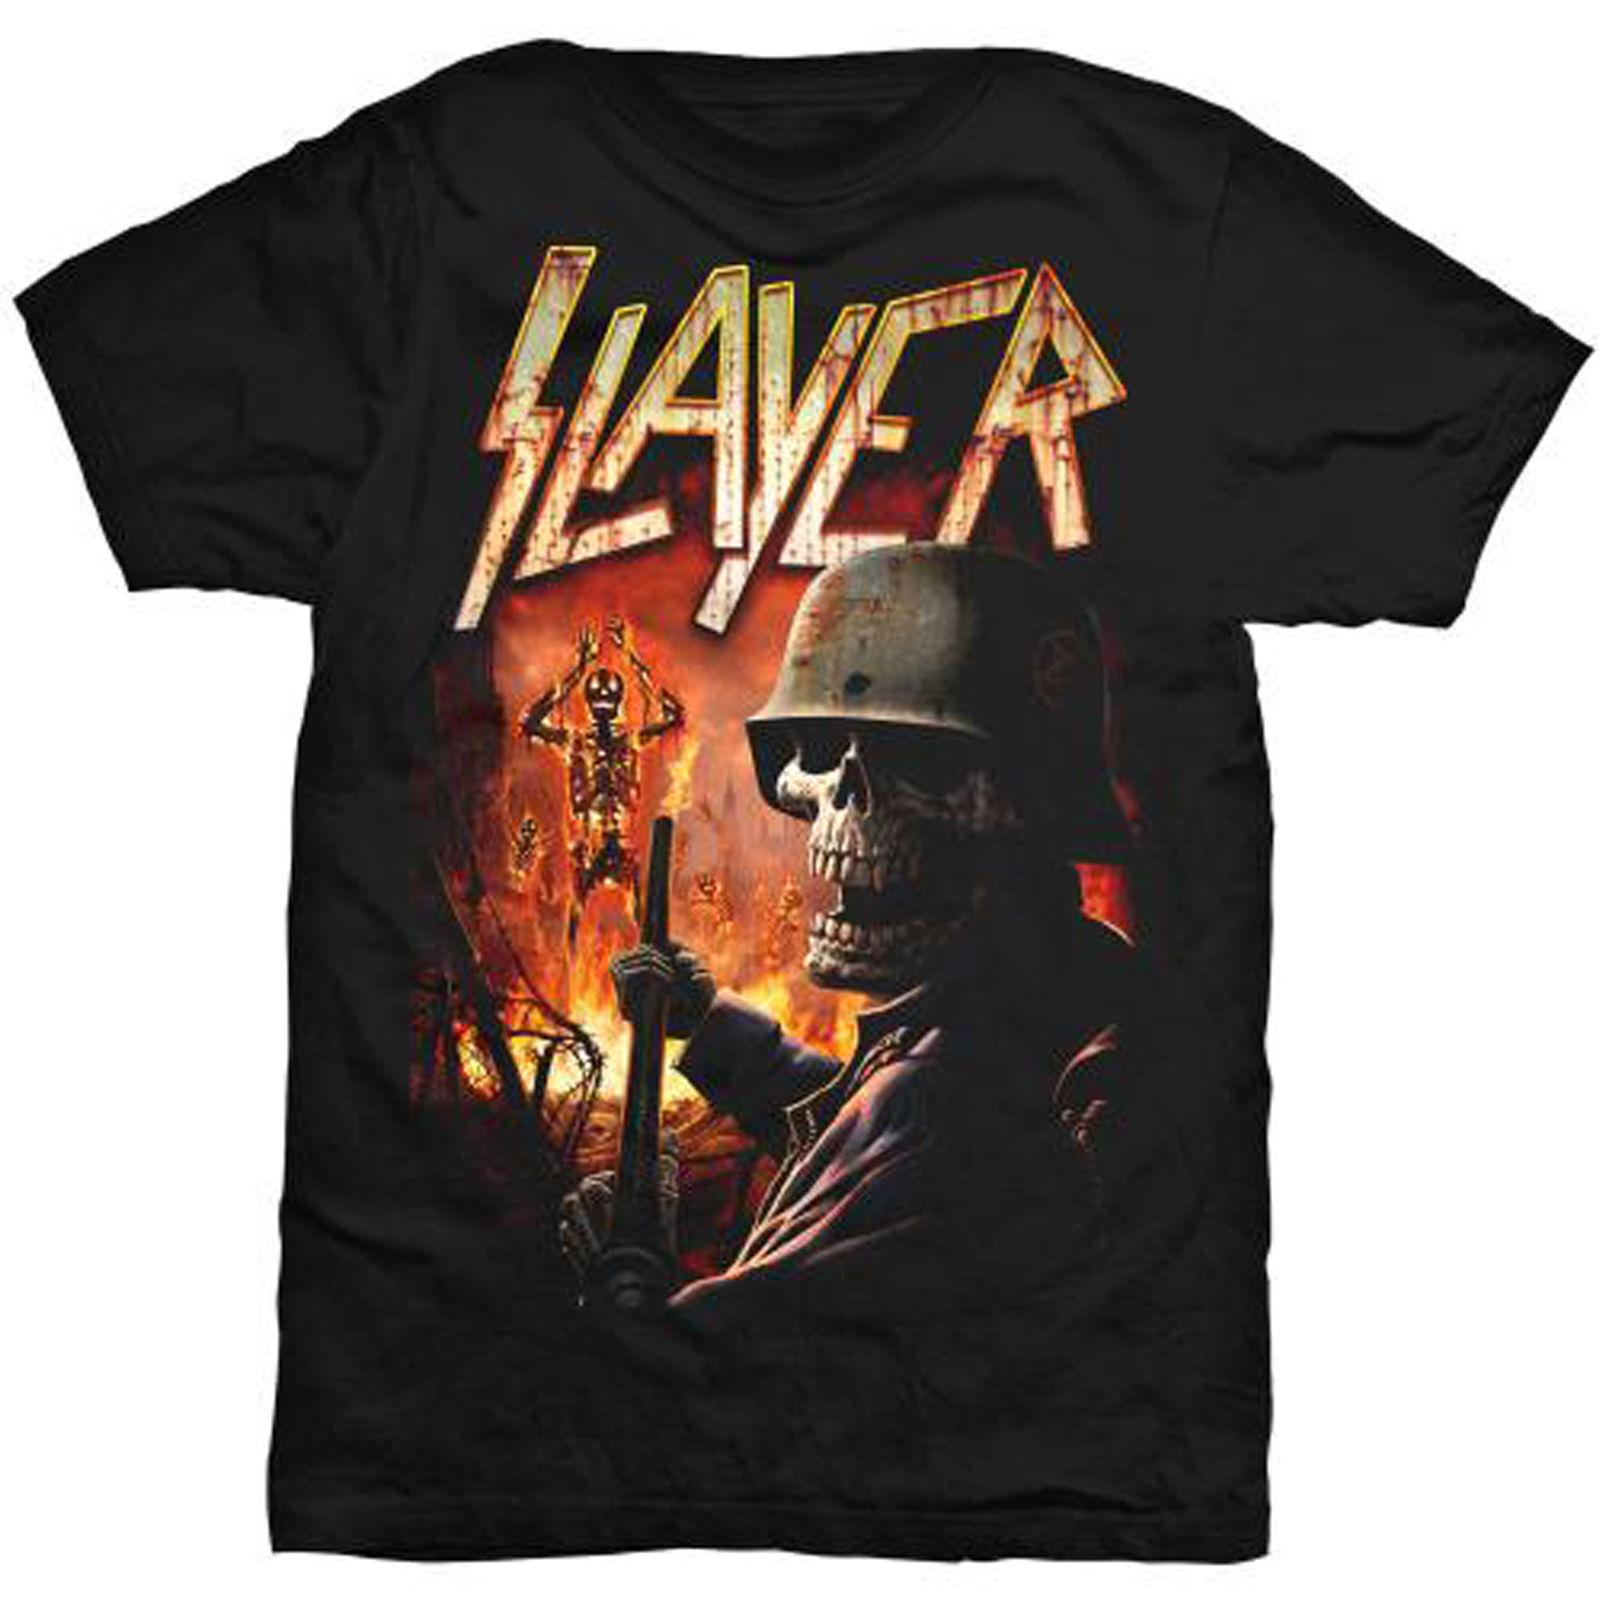 Slayer Burning Fire Thrash Metal Rock T-Shirt Men Short Sleeve T shirt